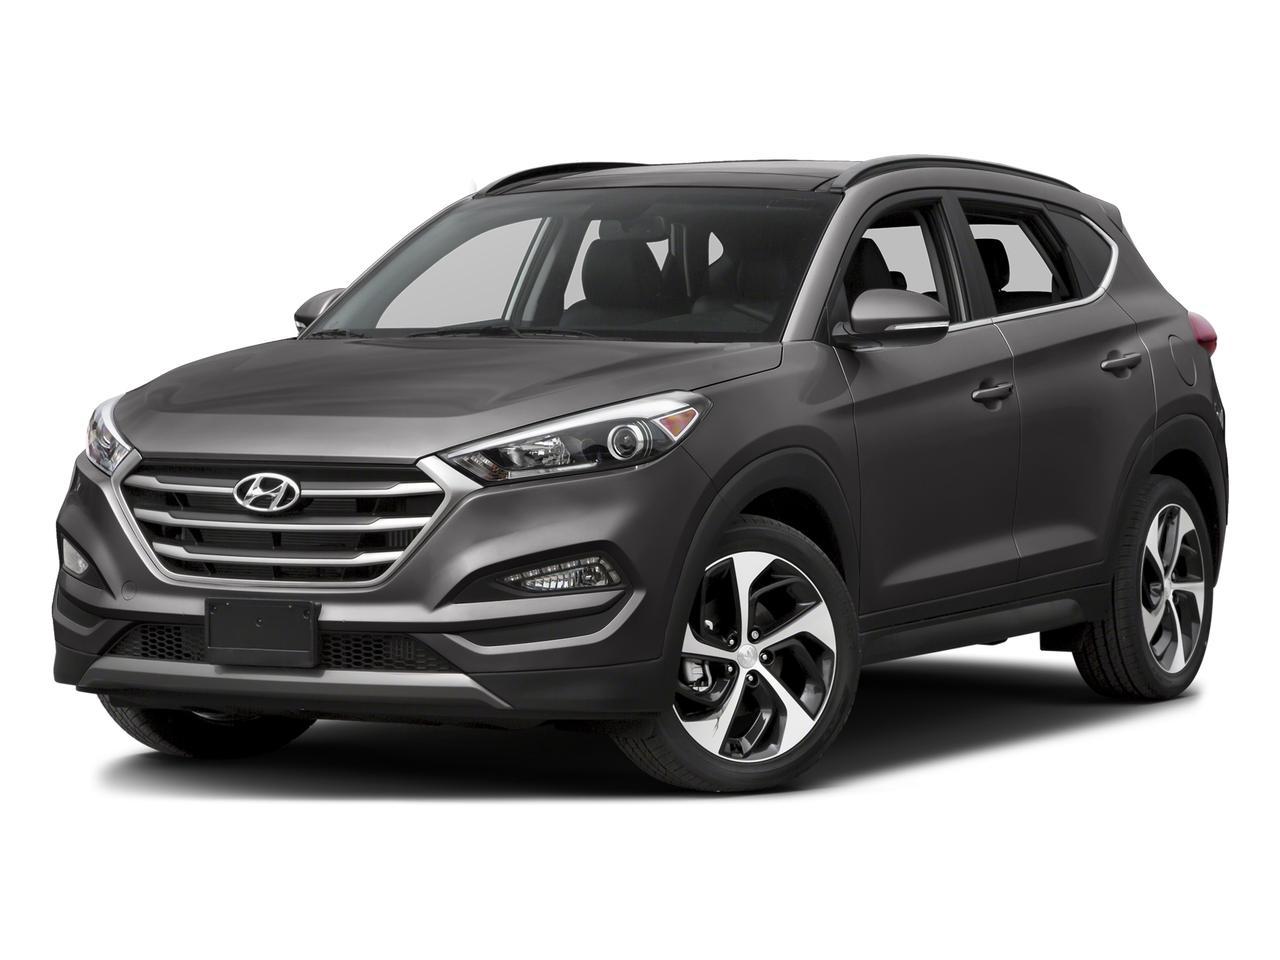 2016 Hyundai Tucson Vehicle Photo in Owensboro, KY 42303